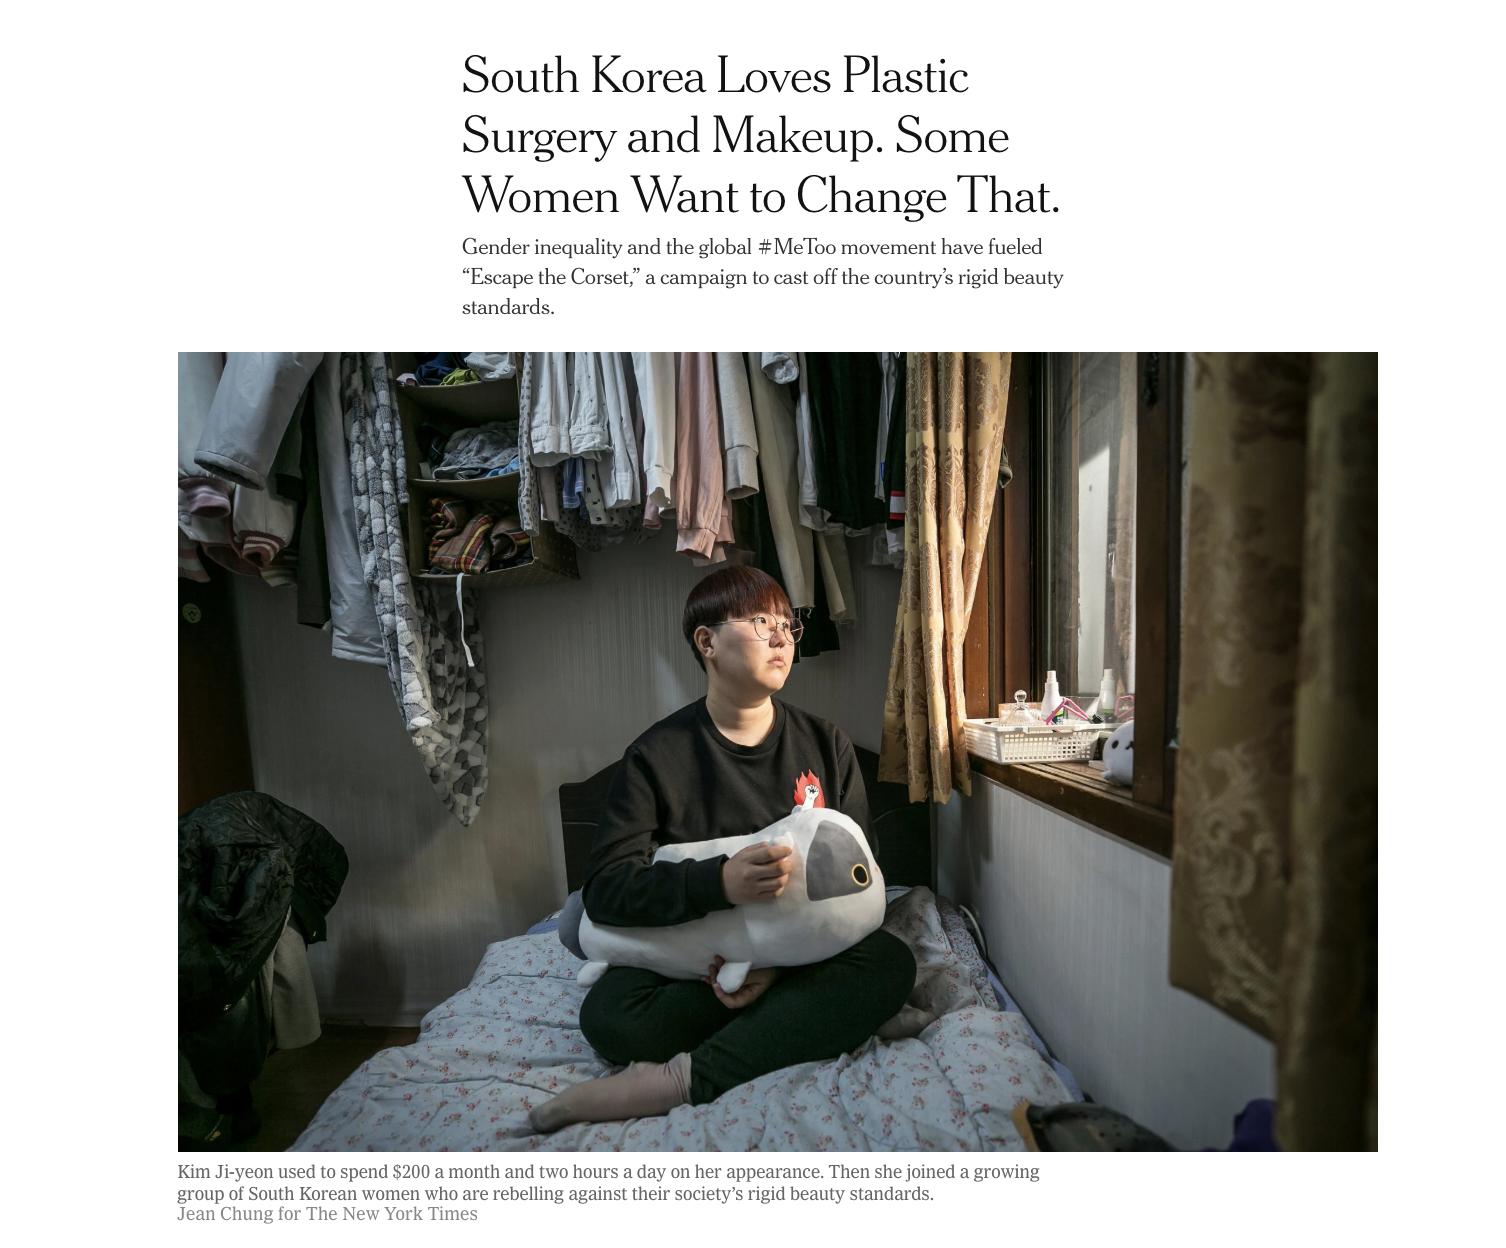 South Korean women rebel against their routines